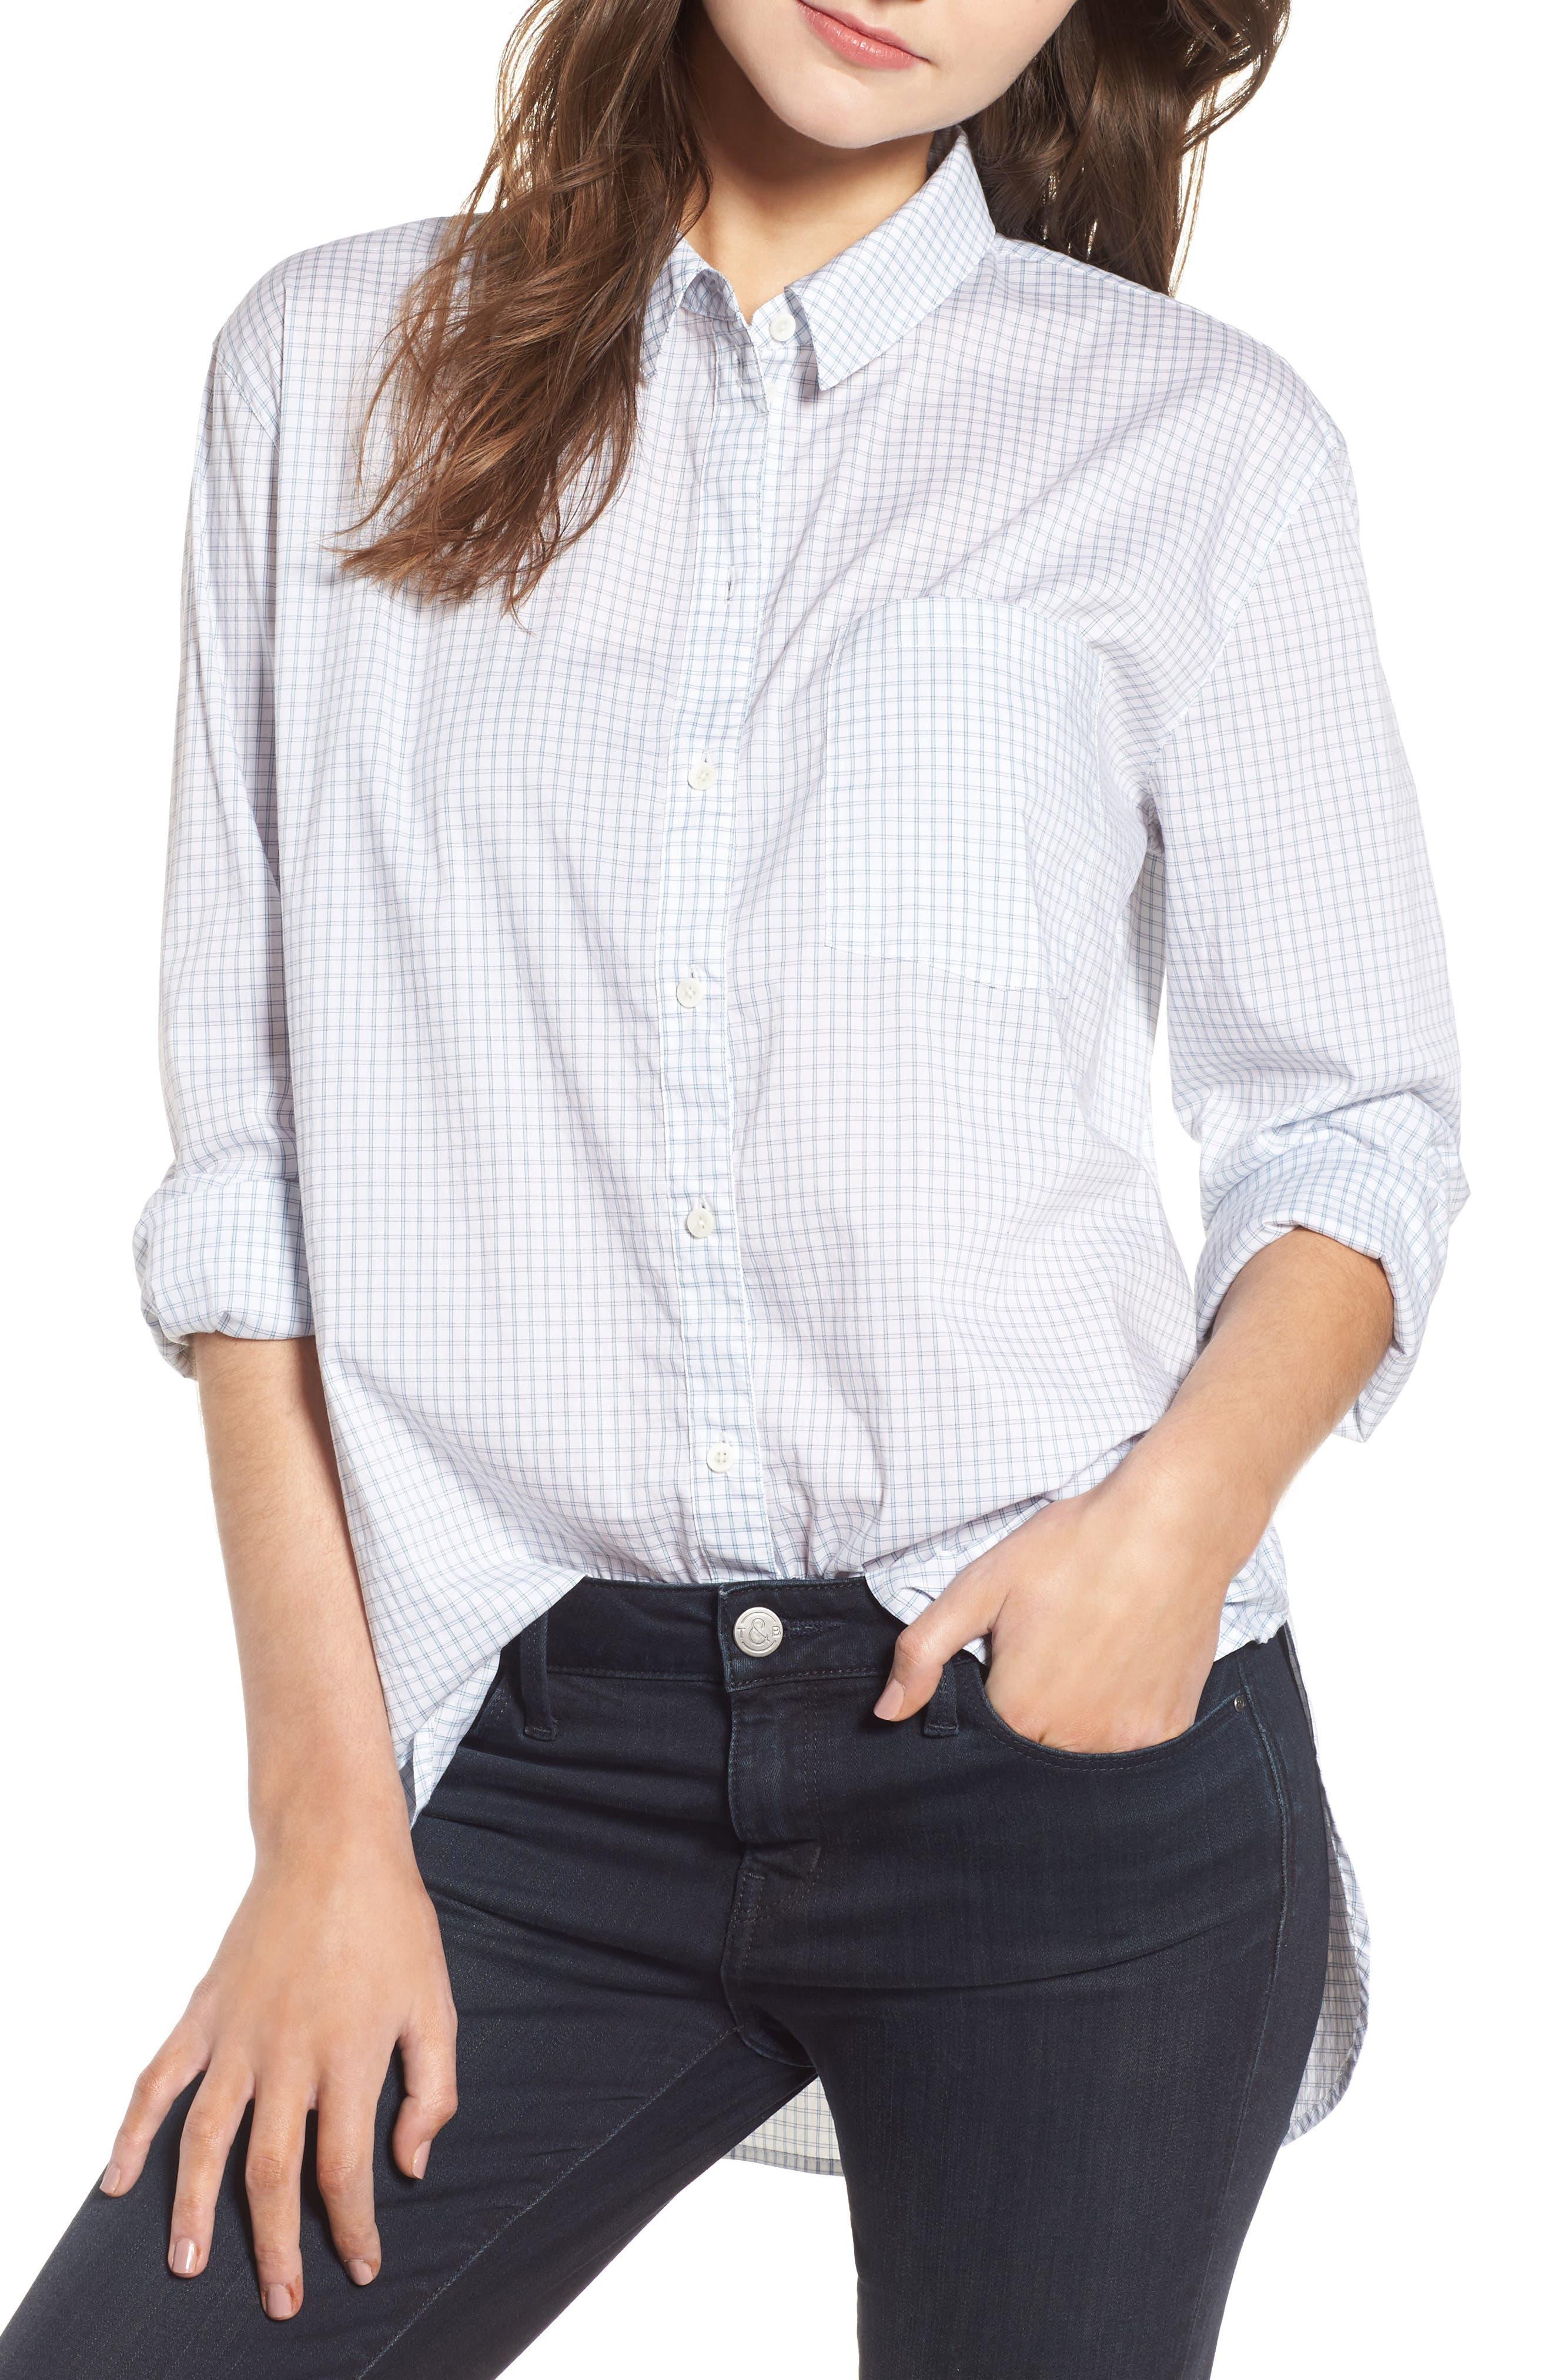 Oversize Check Shirt,                             Main thumbnail 1, color,                             White Blue Poplin Check